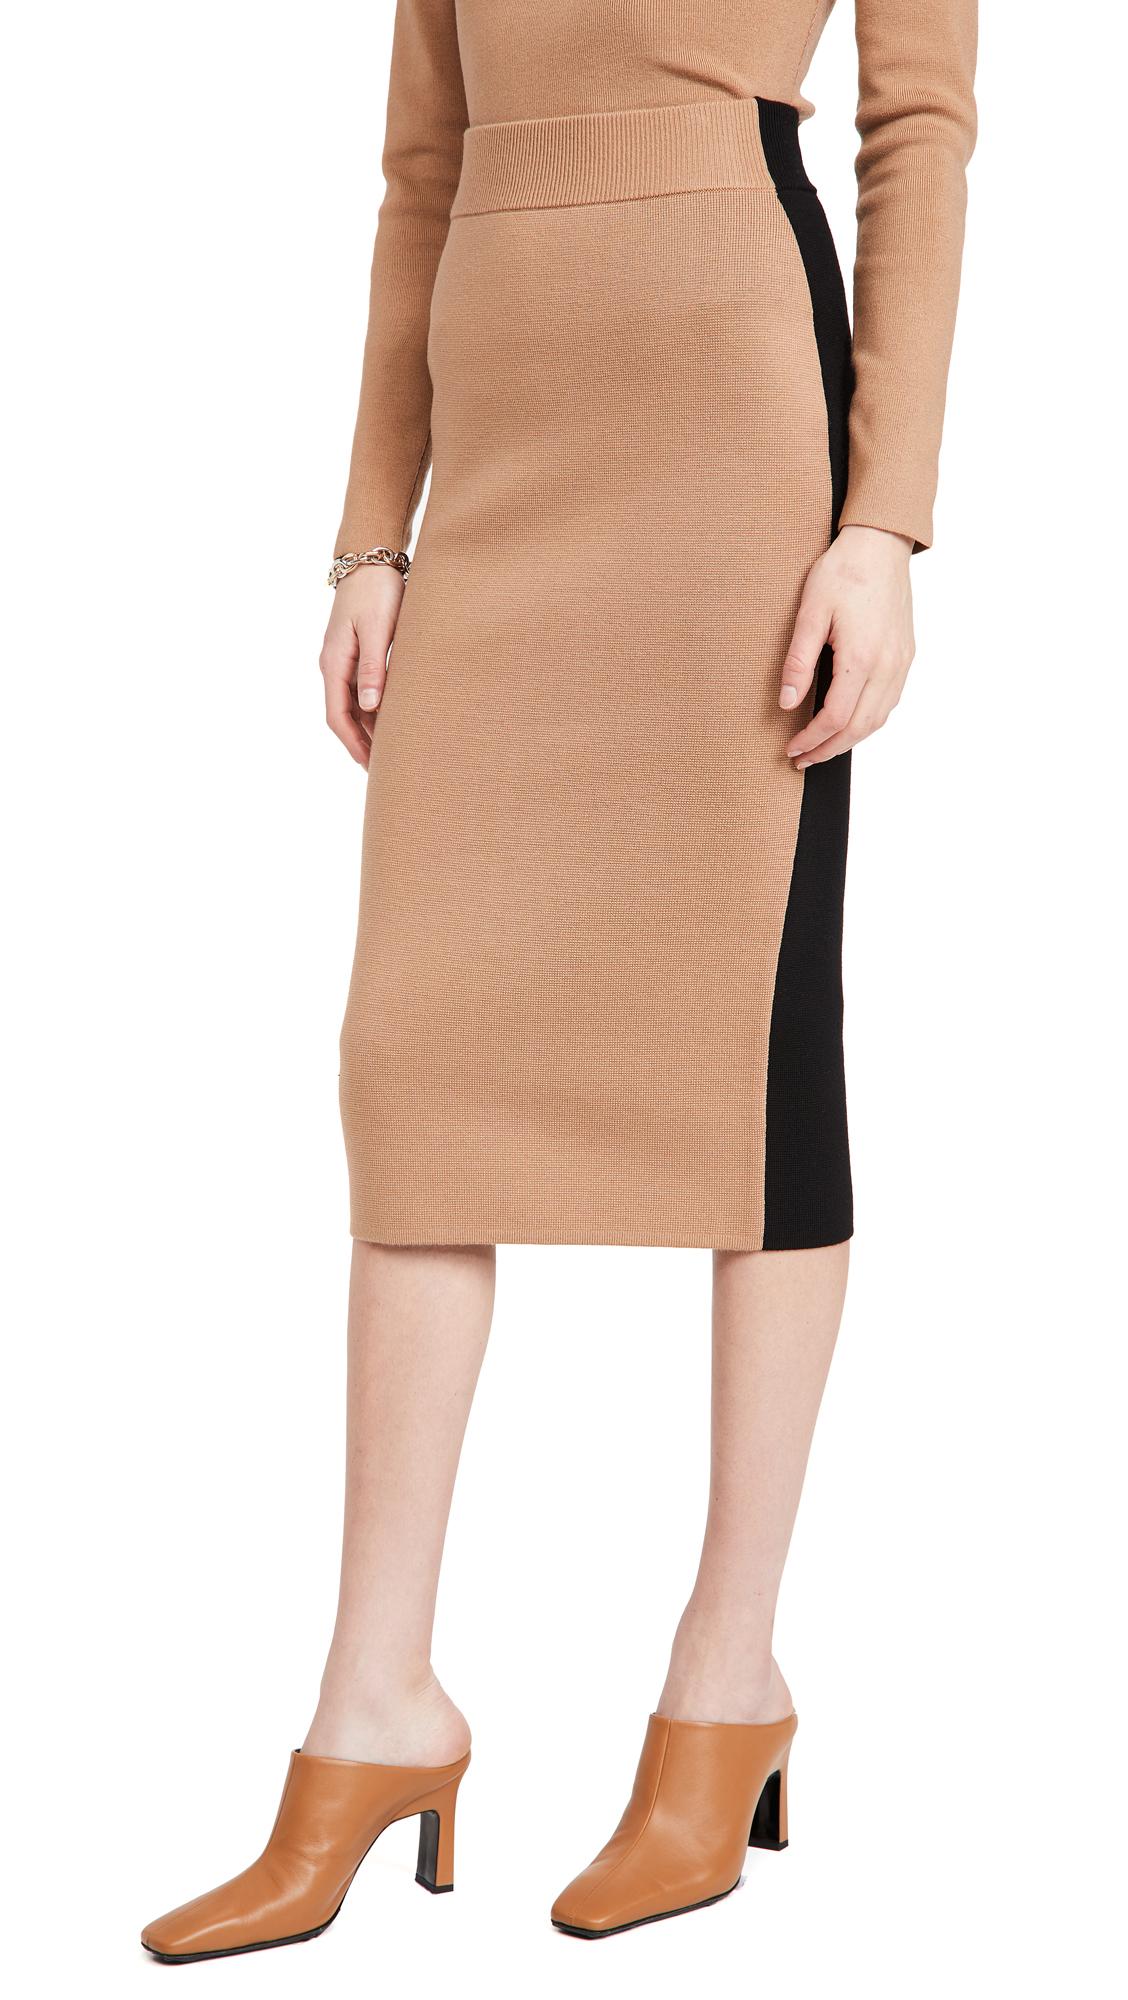 Victor Glemaud Colorblock Skirt